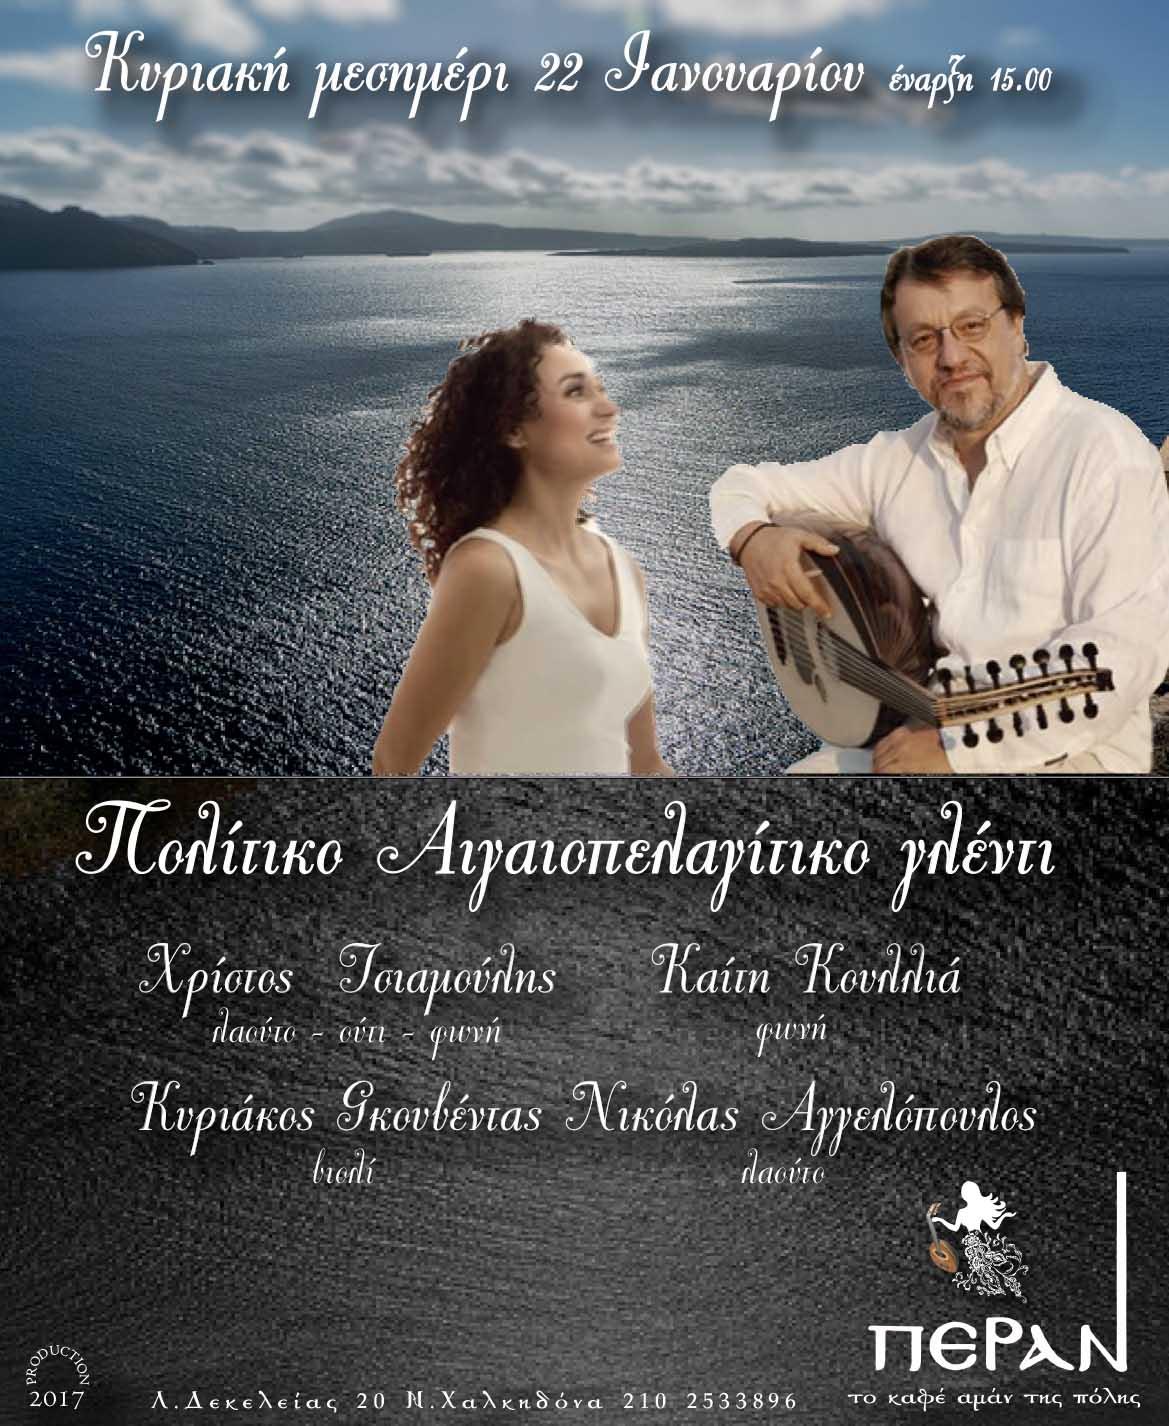 TSIAMOYLIS-KOYLLLIA 22-1